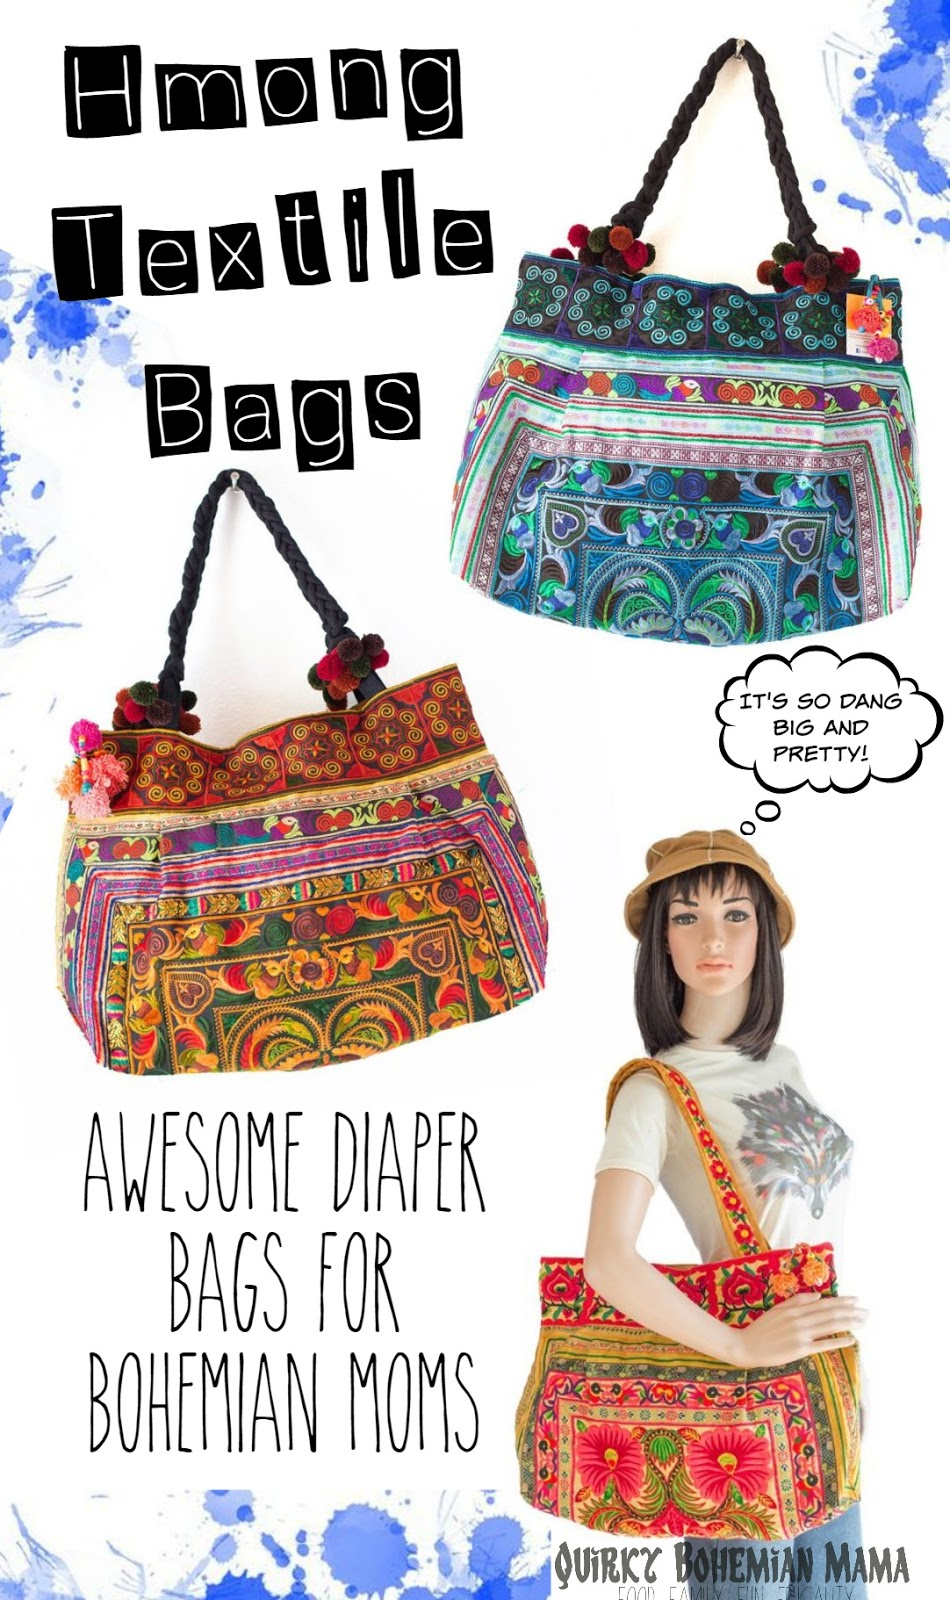 d8f5dc5c2 Quirky Bohemian Mama - A Bohemian Mom Blog  Hmong Textile Bohemian ...